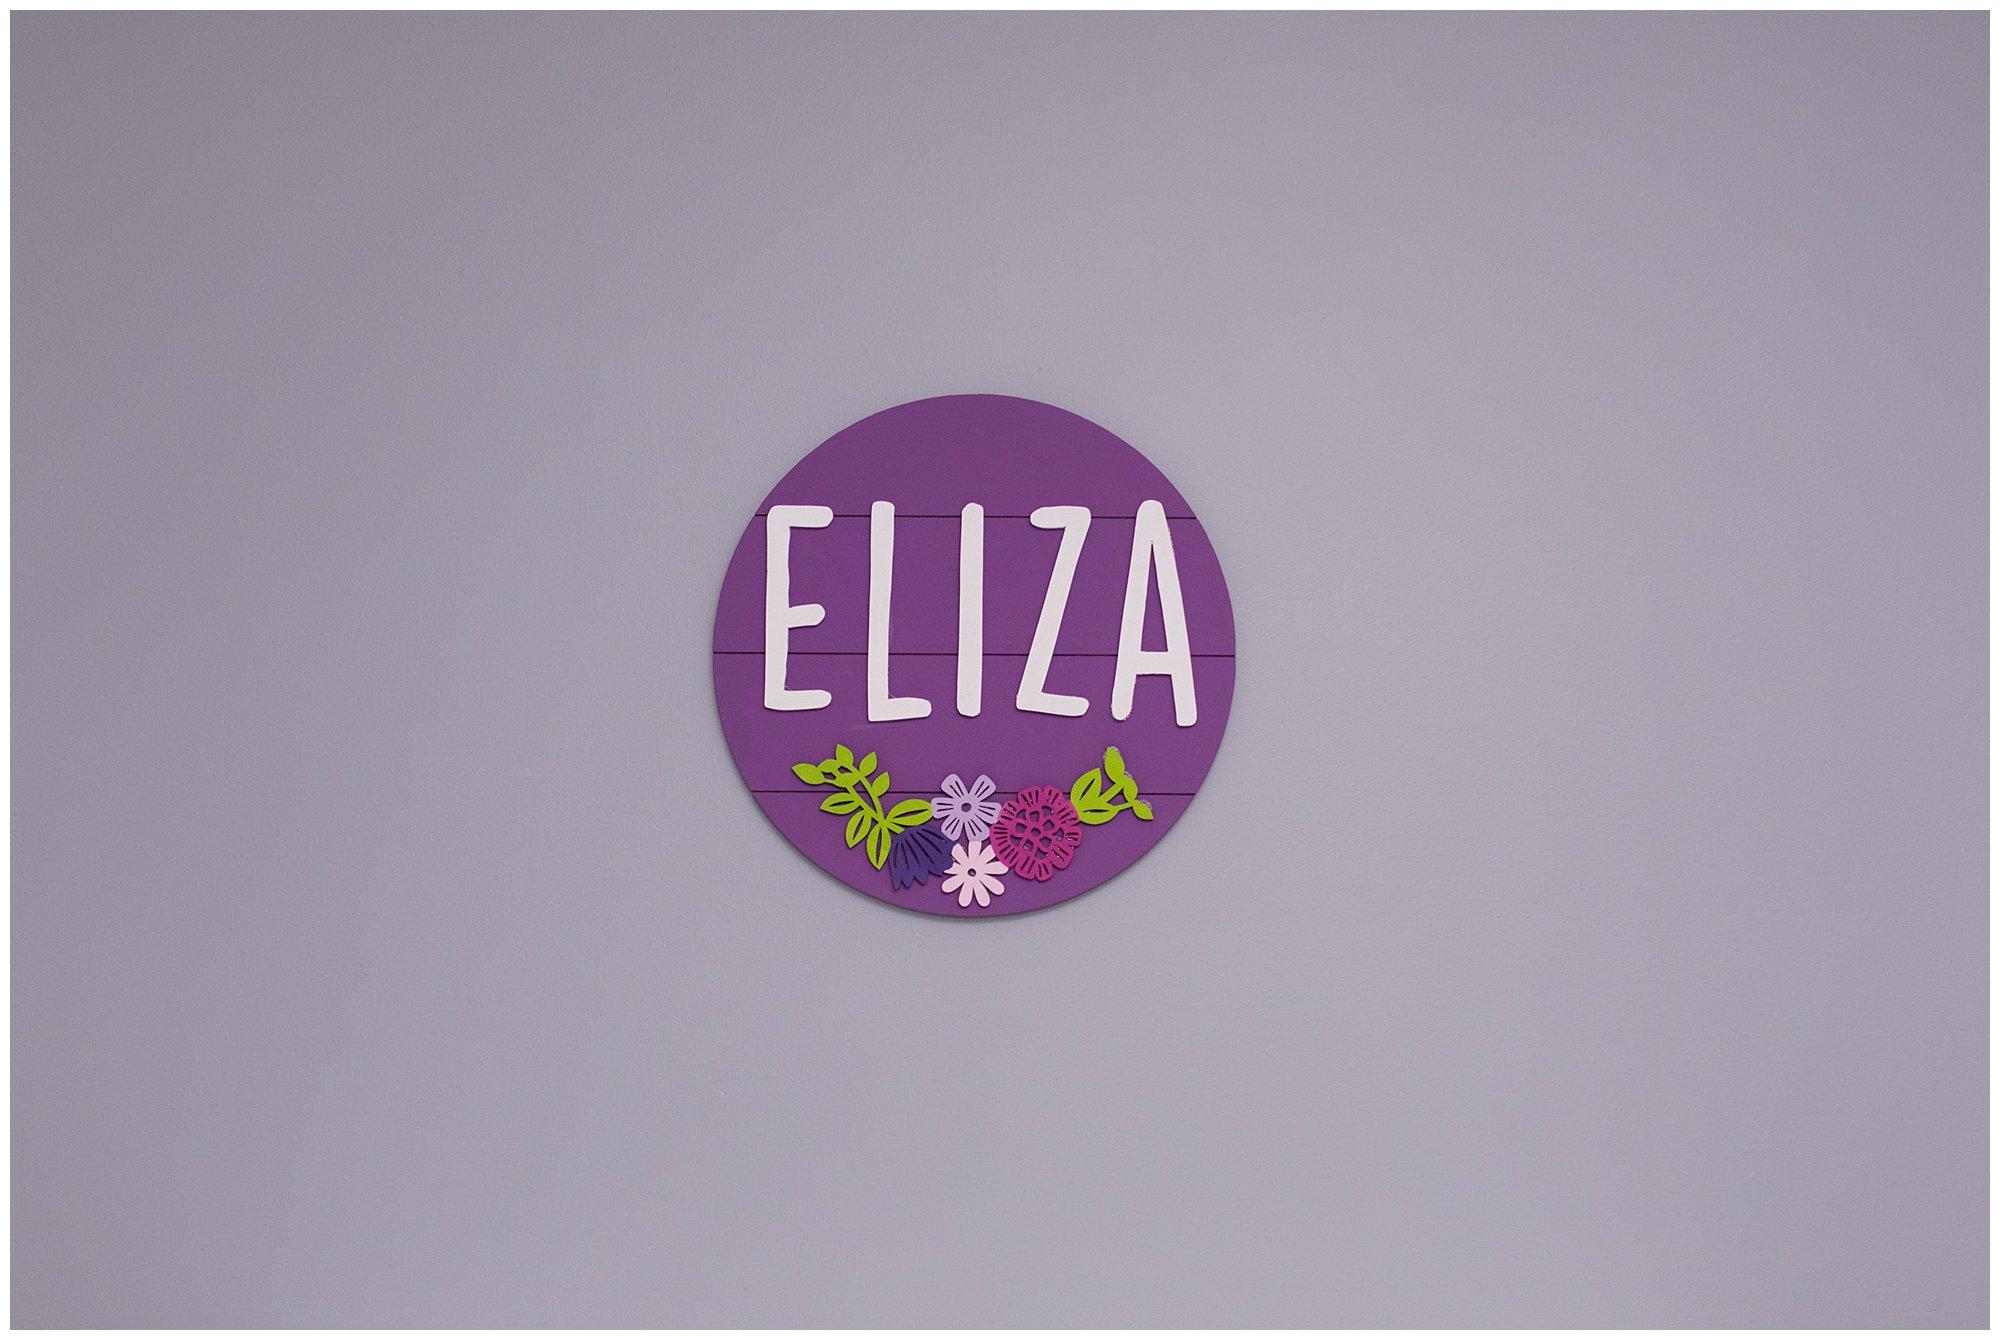 handmade sign that says Eliza in newborn's nursery